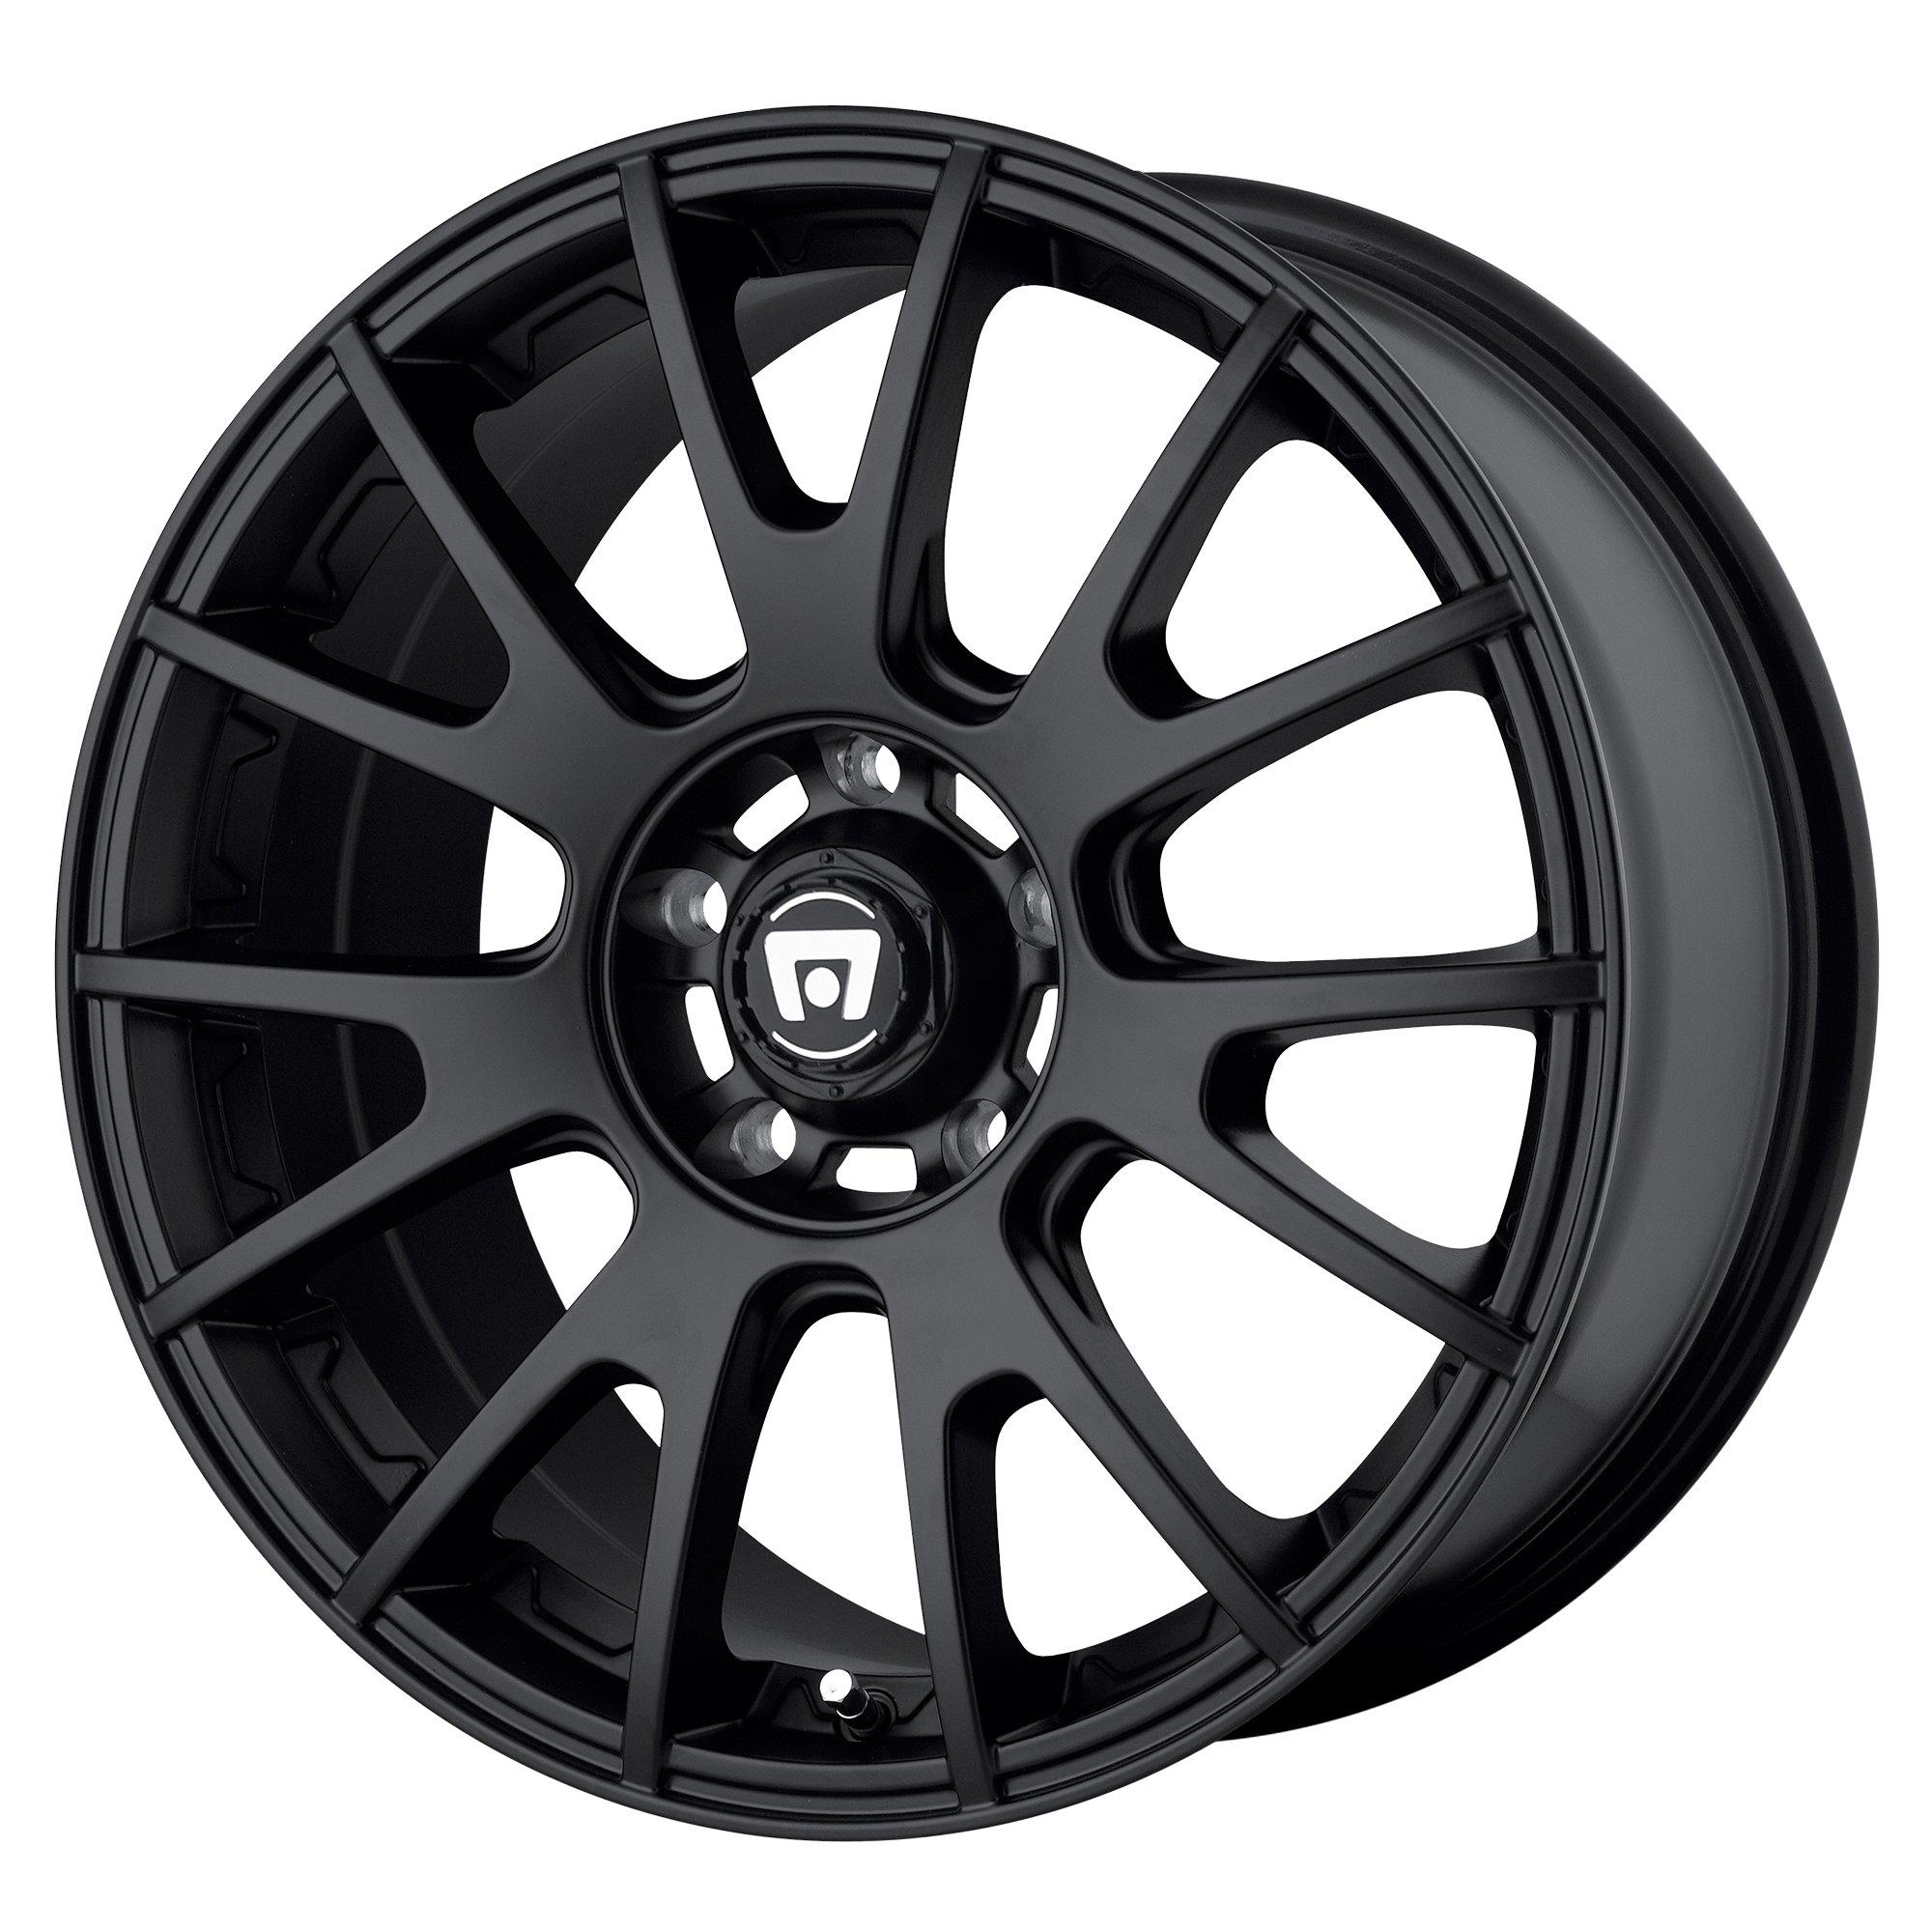 "Motegi 18x8 MR118 Wheel Matte Black 5x4.5 5x114.3 PCD 45mm Offset 6.27/""BS"